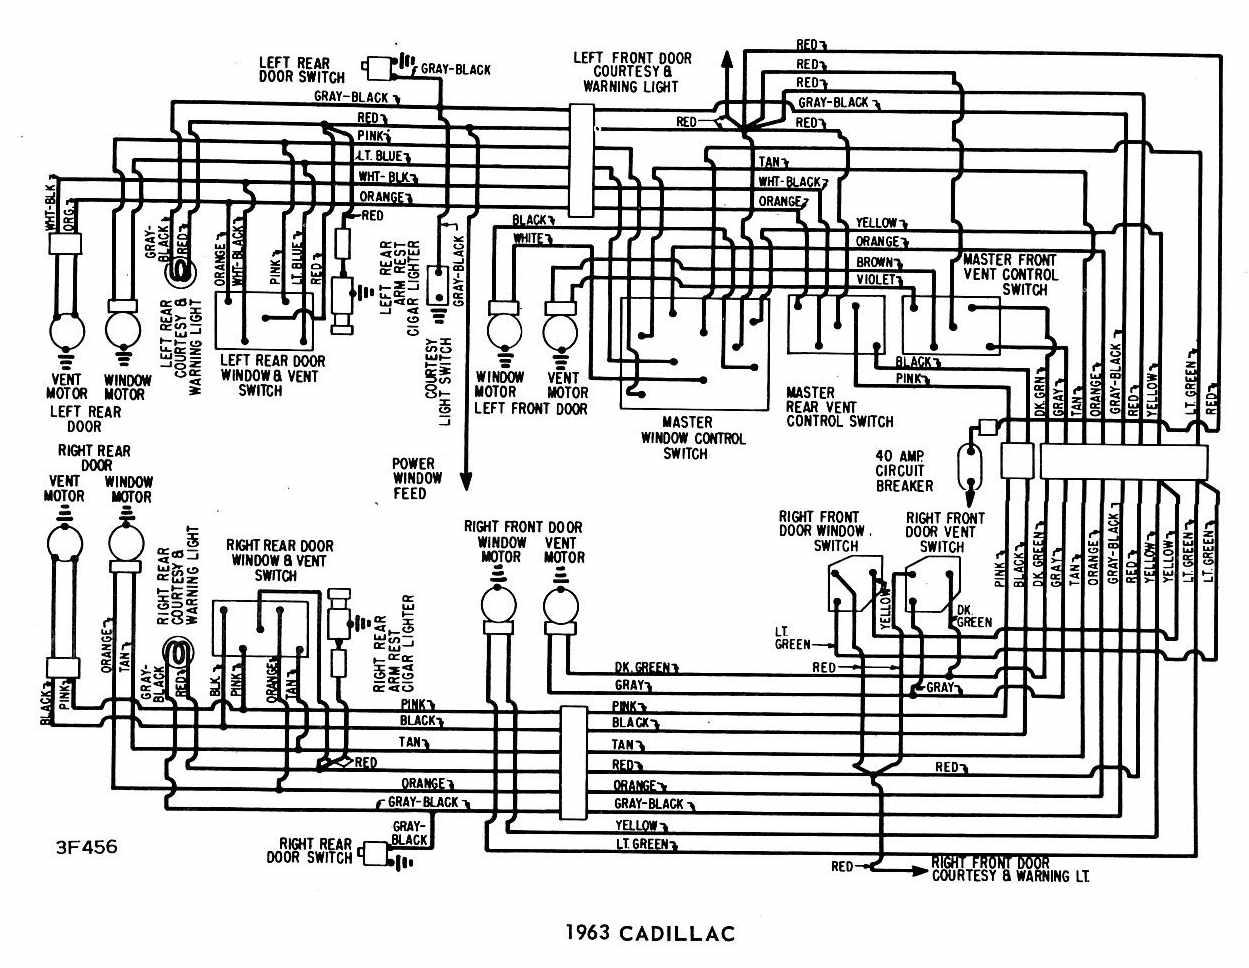 omega ib pljx wiring diagram